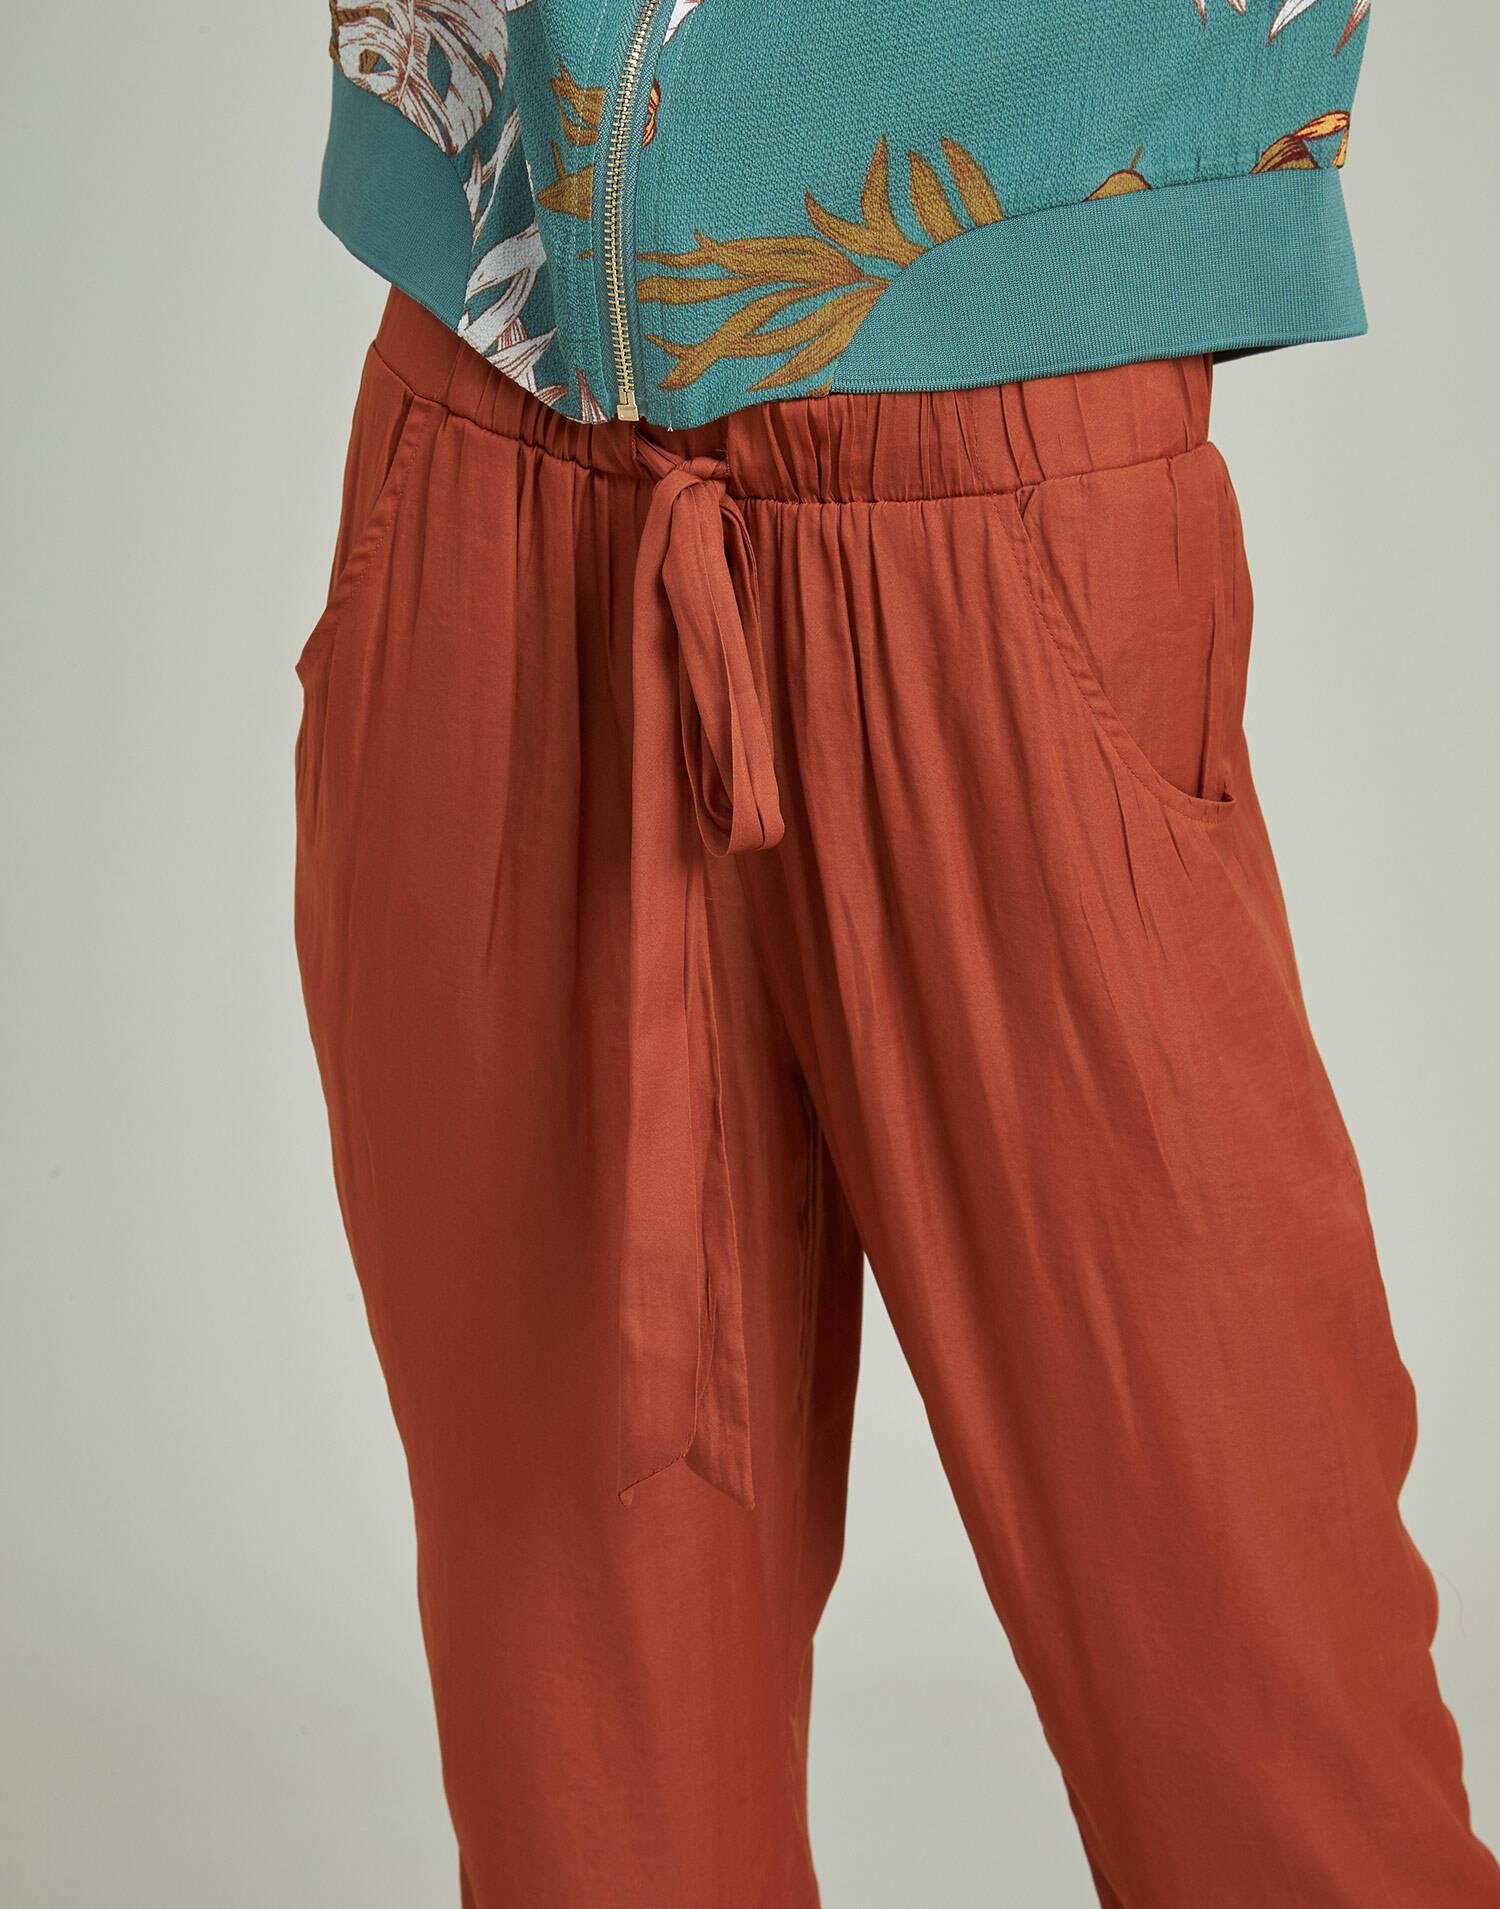 Pantalón tobillero con bajo vuelto